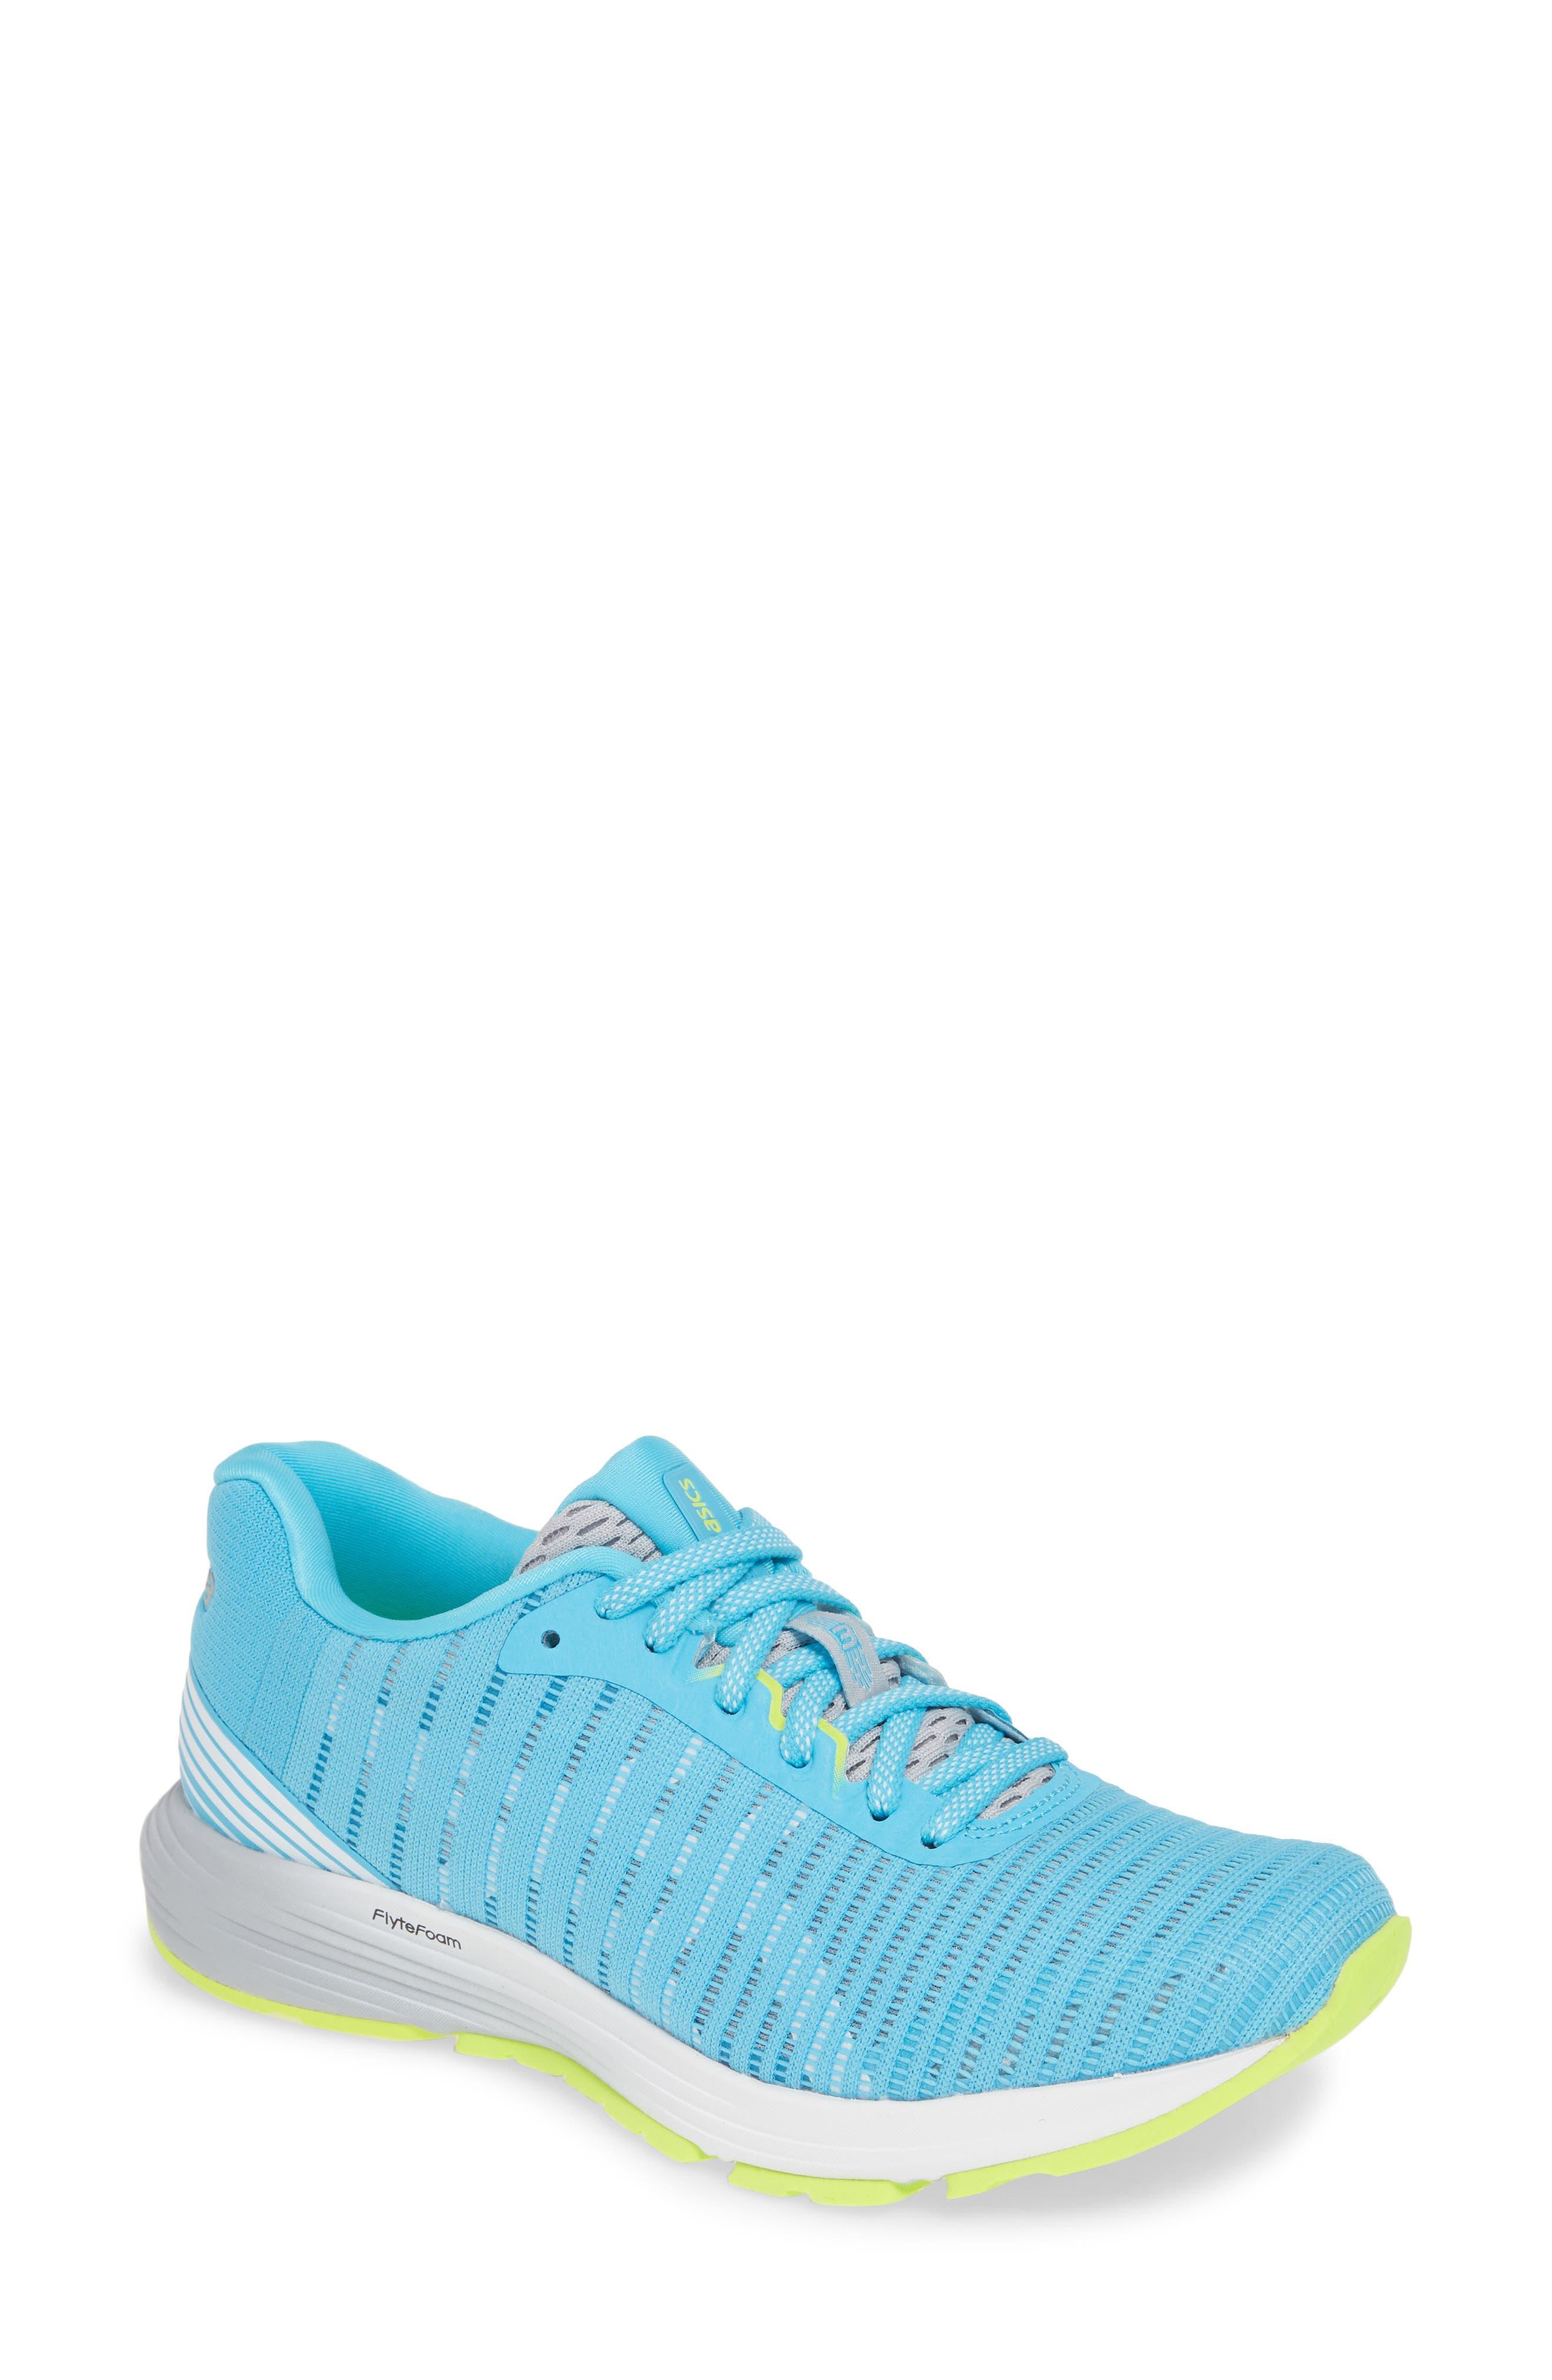 Asics Dynaflyte 3 Running Shoe, Blue/green